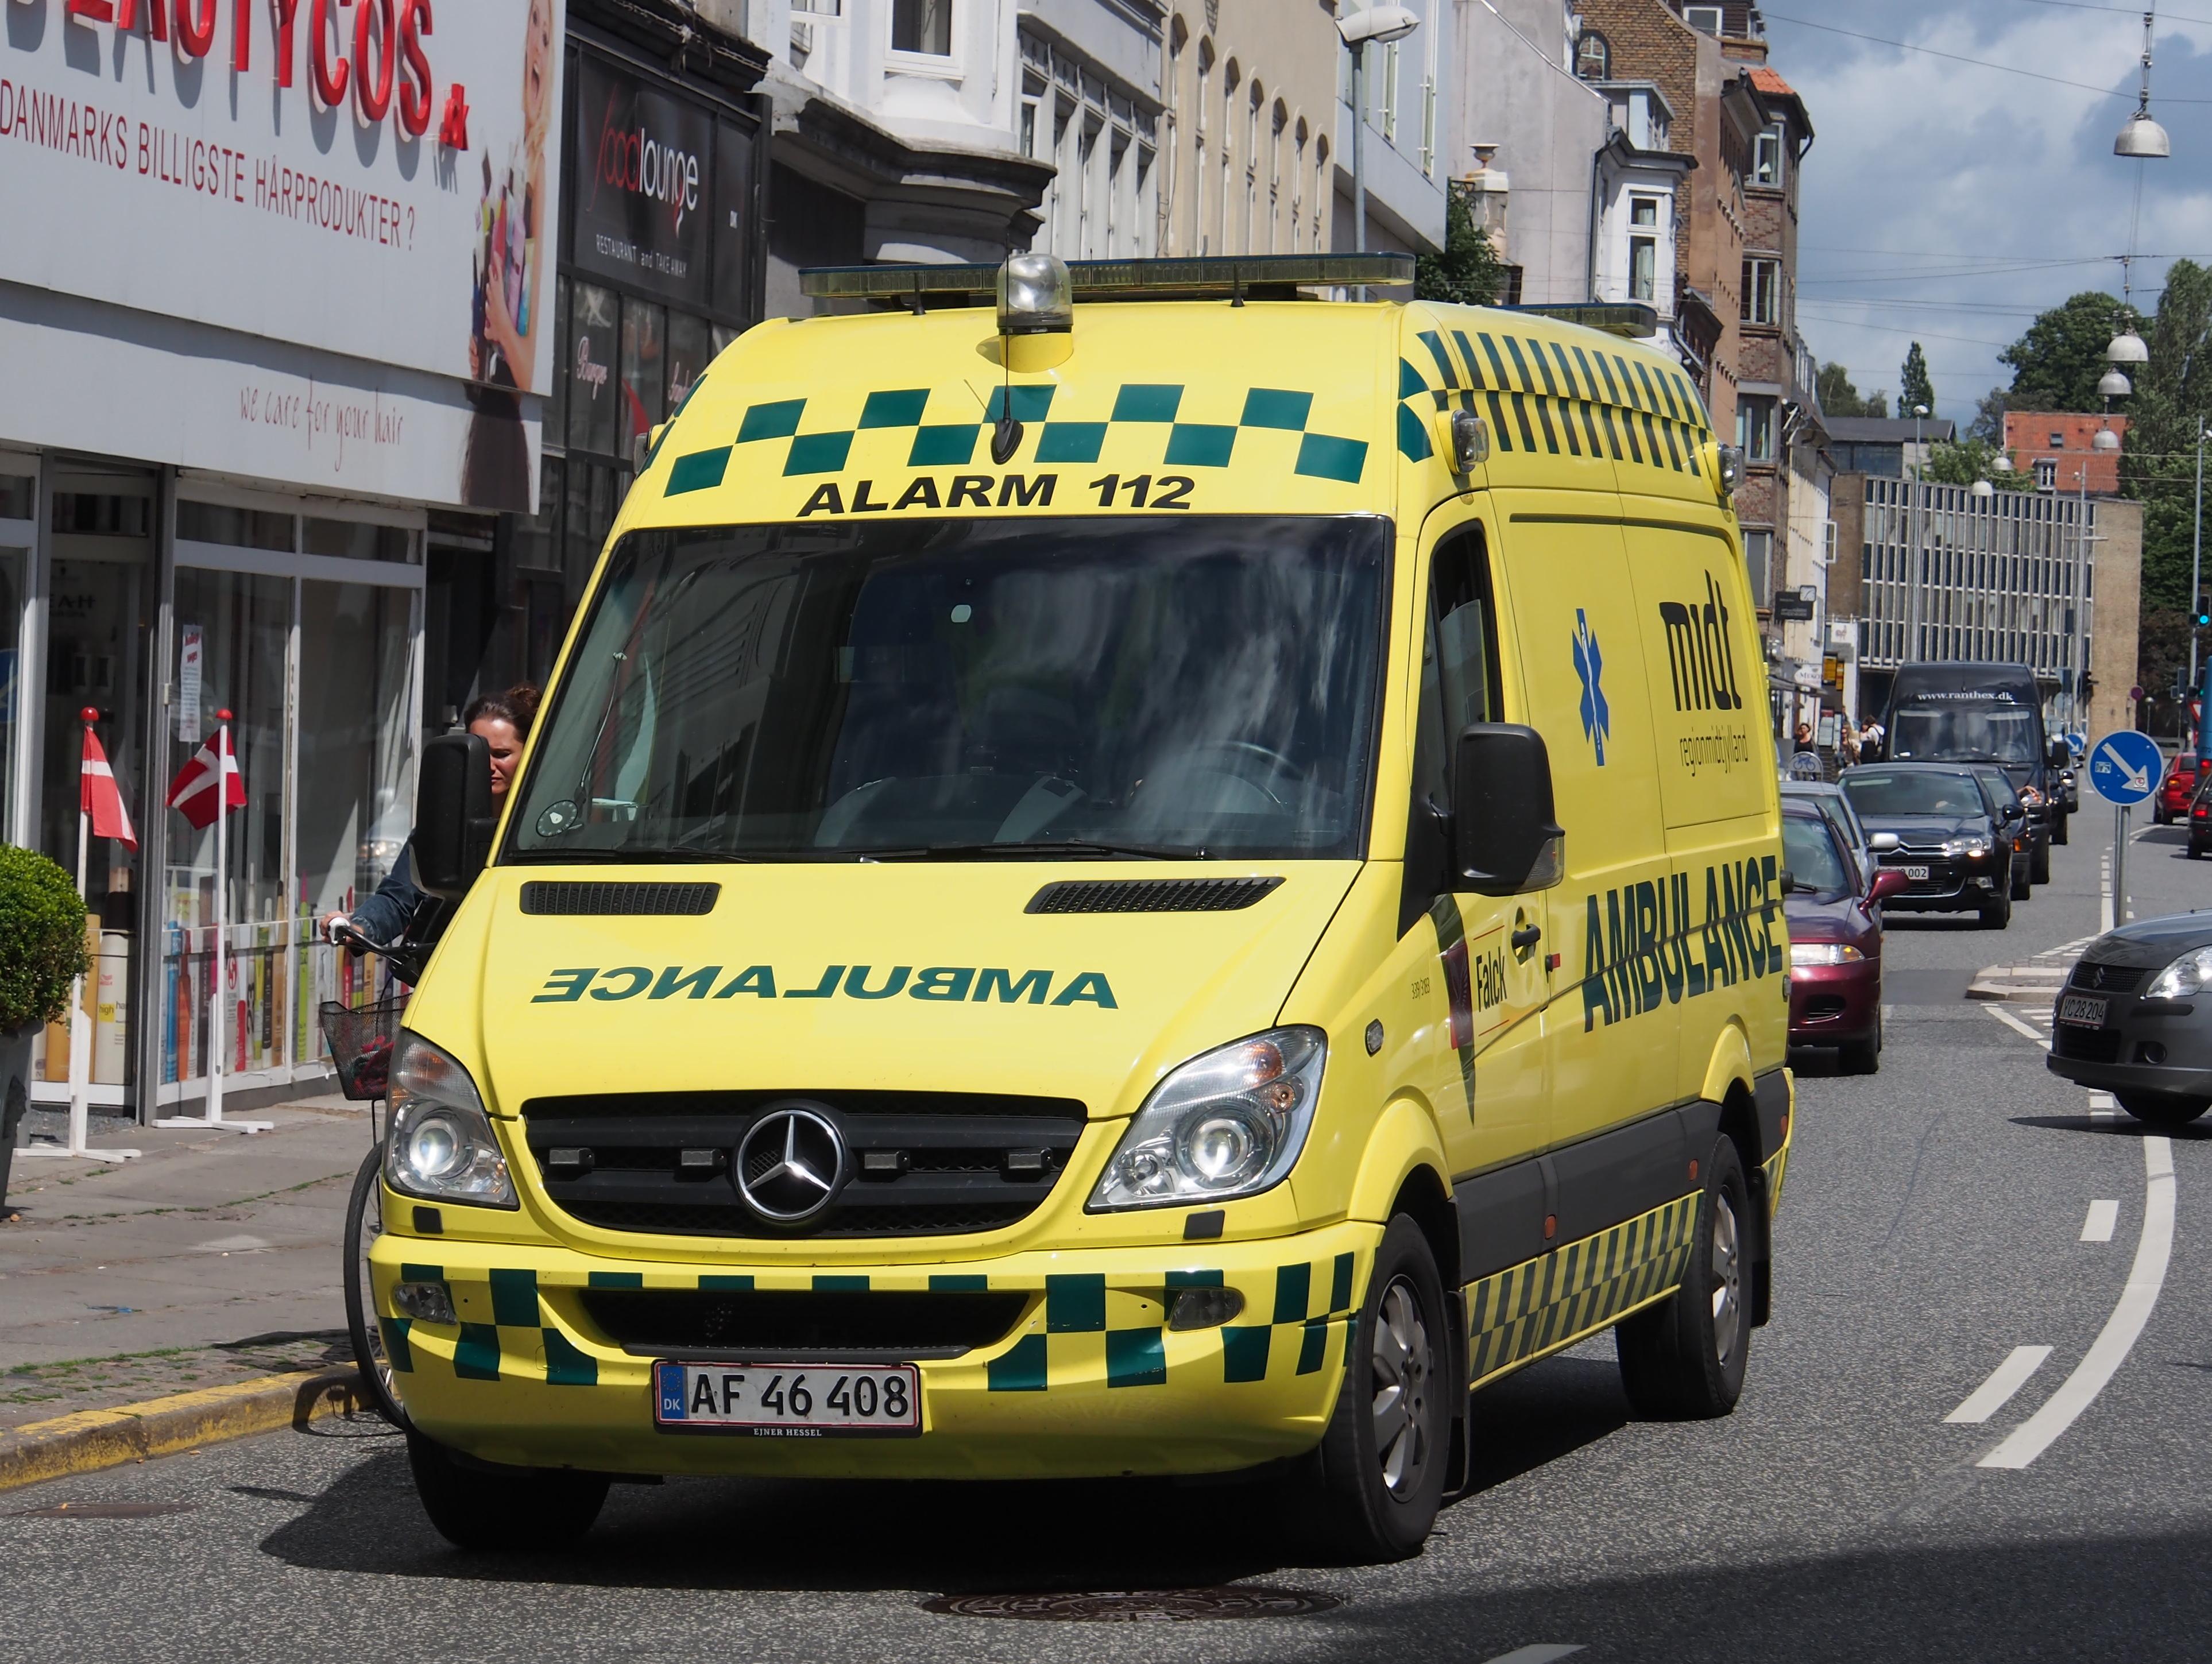 Mercedes Work Van >> File:Mercedes Falck ambulance, Århus.JPG - Wikimedia Commons